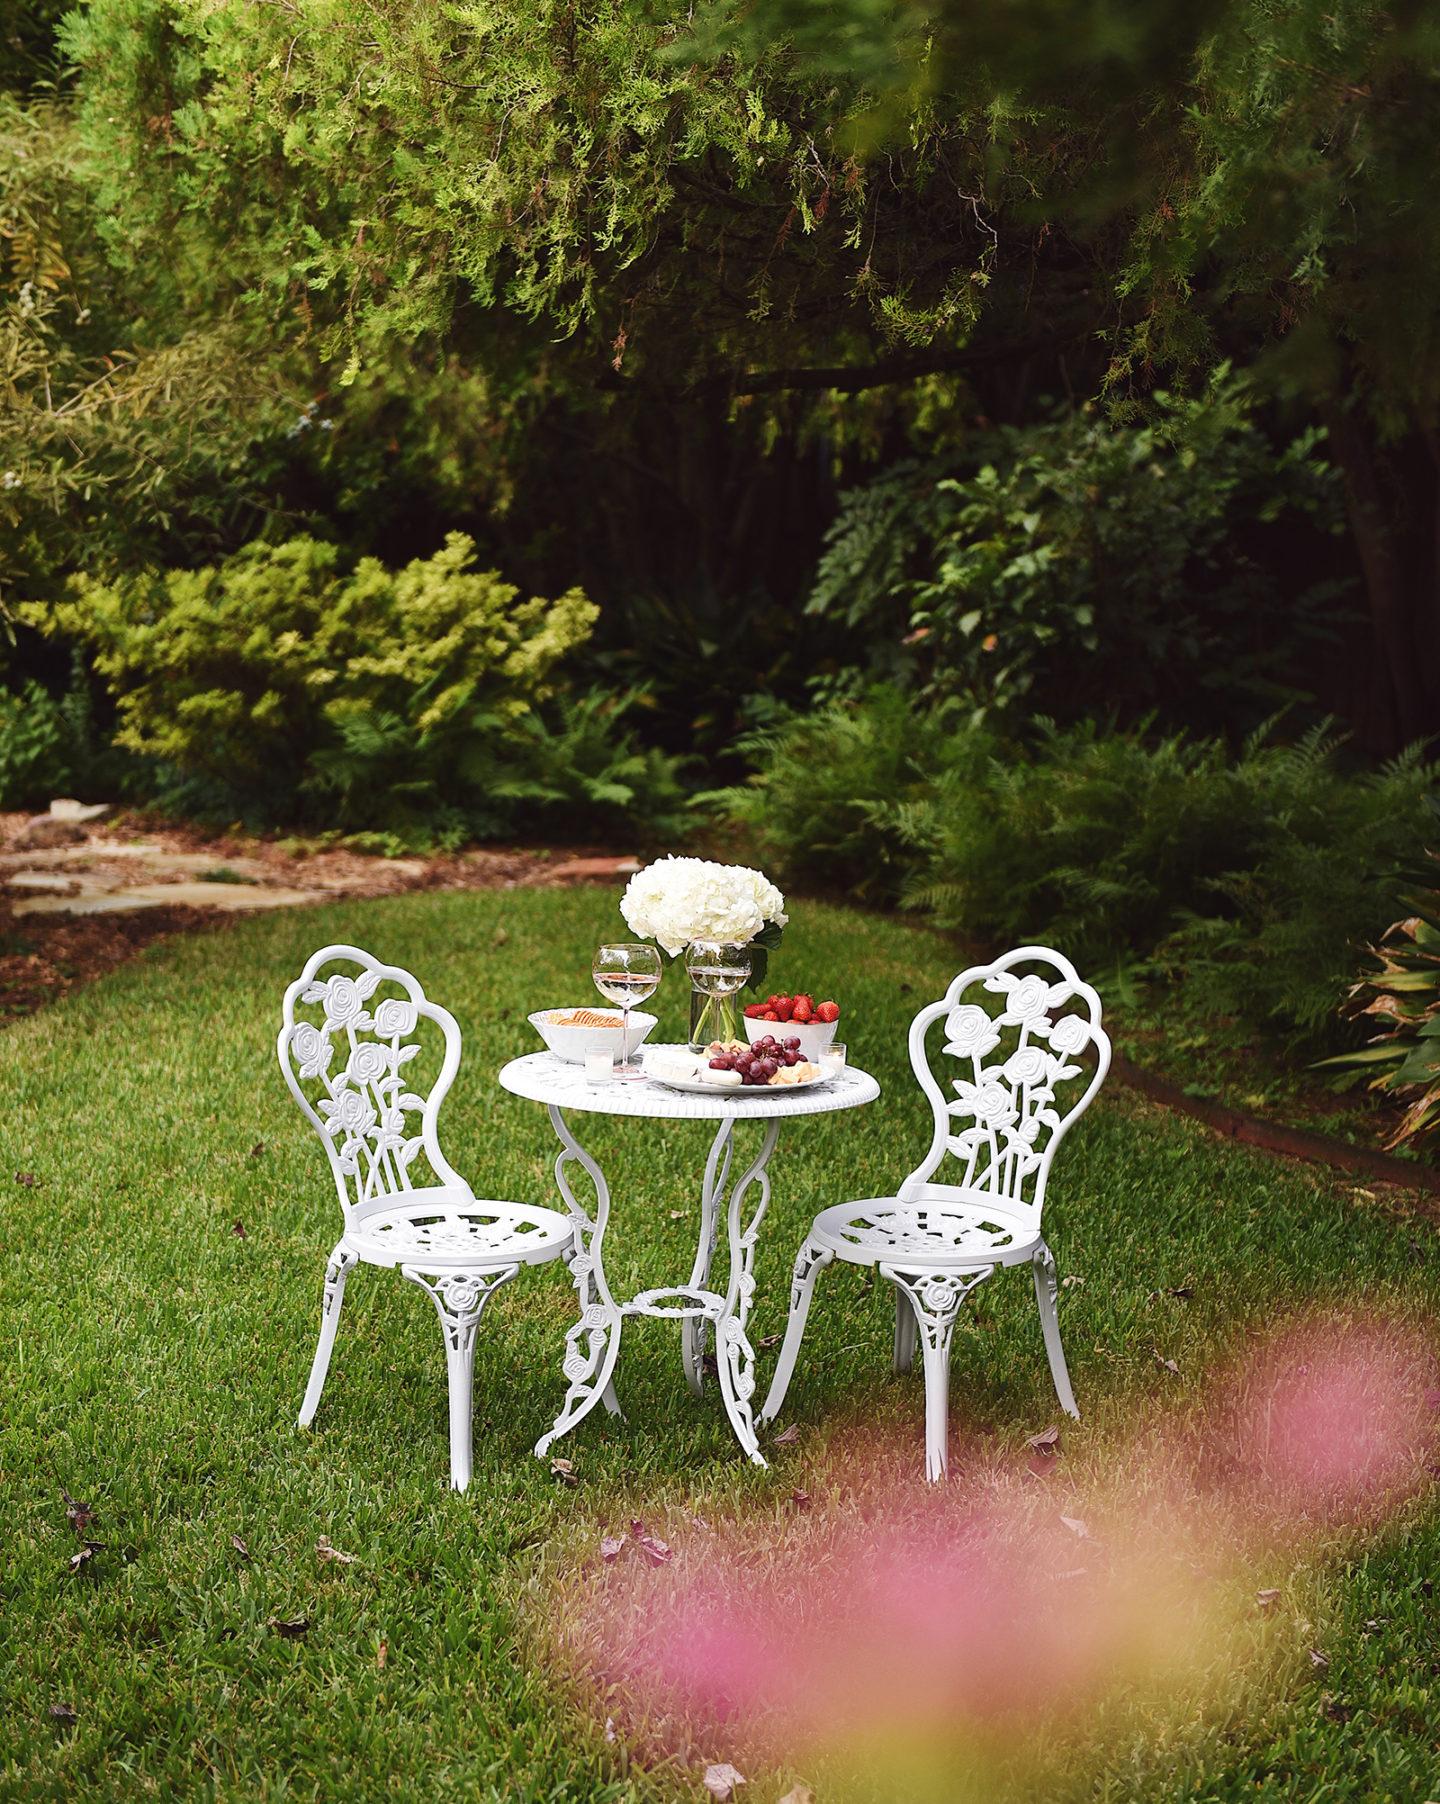 Lo-Murphy-Walmart-Cheeseboard-Date-Night-dallas-blogger-outdoor-furniture